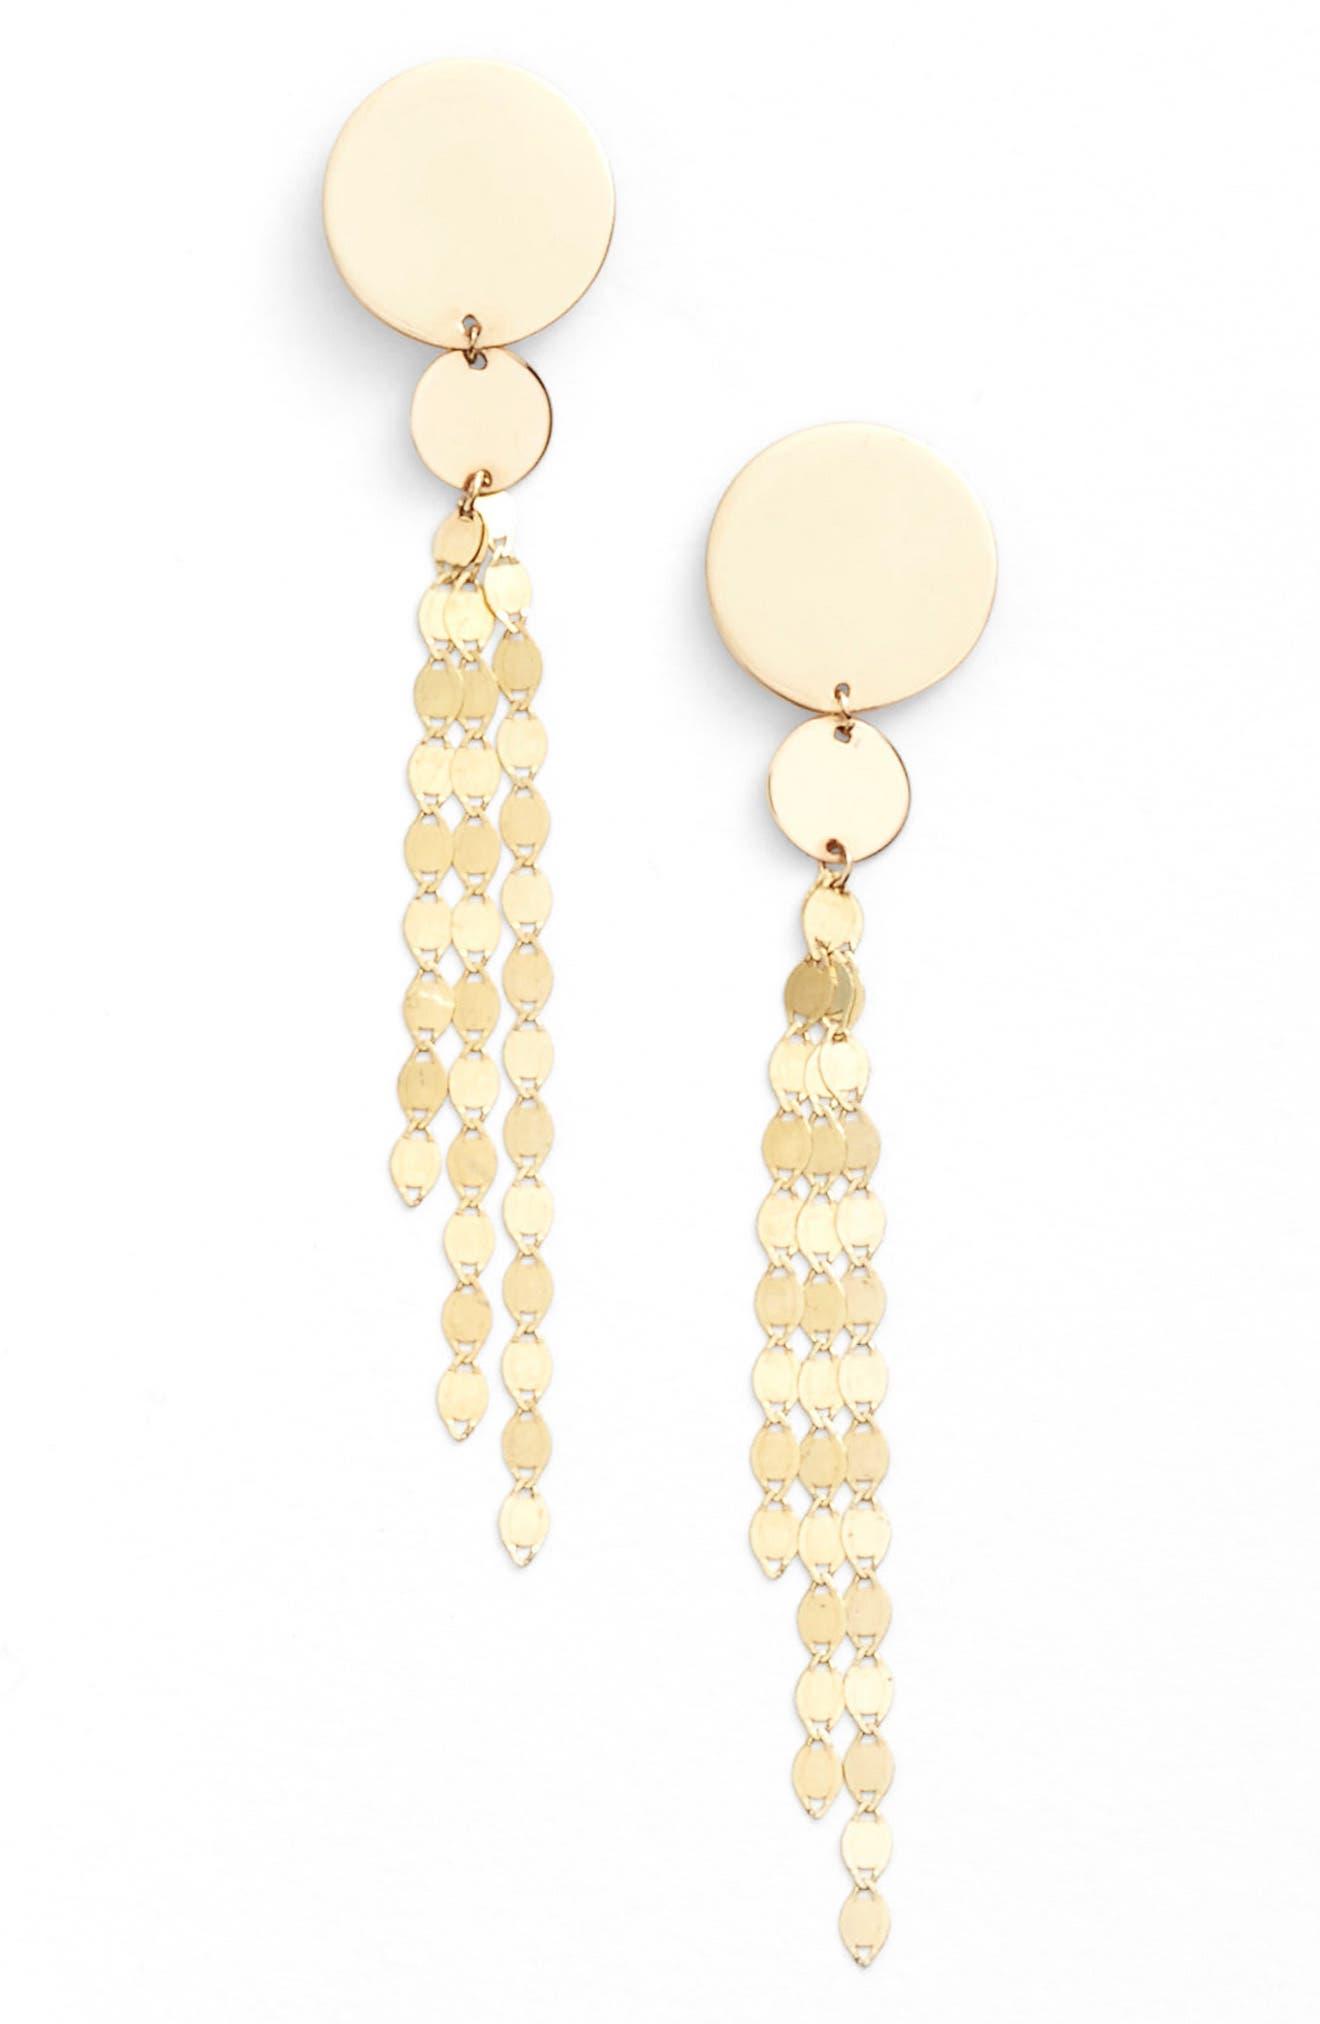 Disc Drop Earrings,                             Main thumbnail 1, color,                             YELLOW GOLD